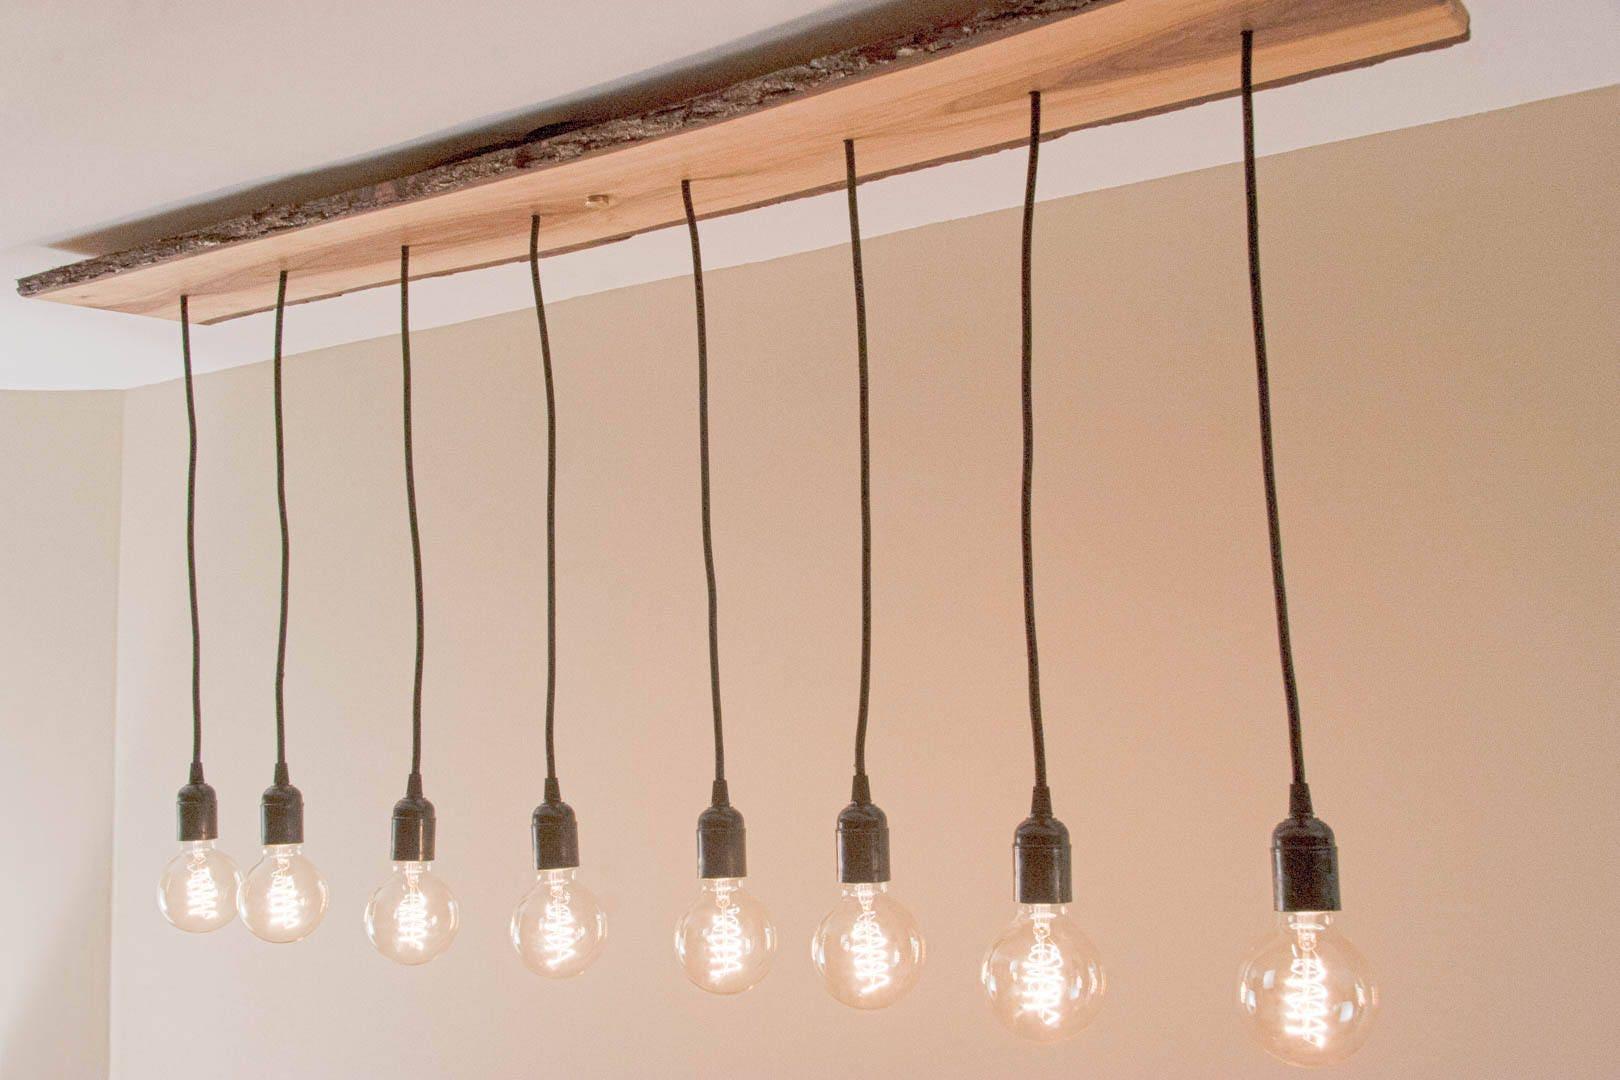 Custom wood light fixture 8 pendant restaurant dining chandelier rustic wood edison pendant light